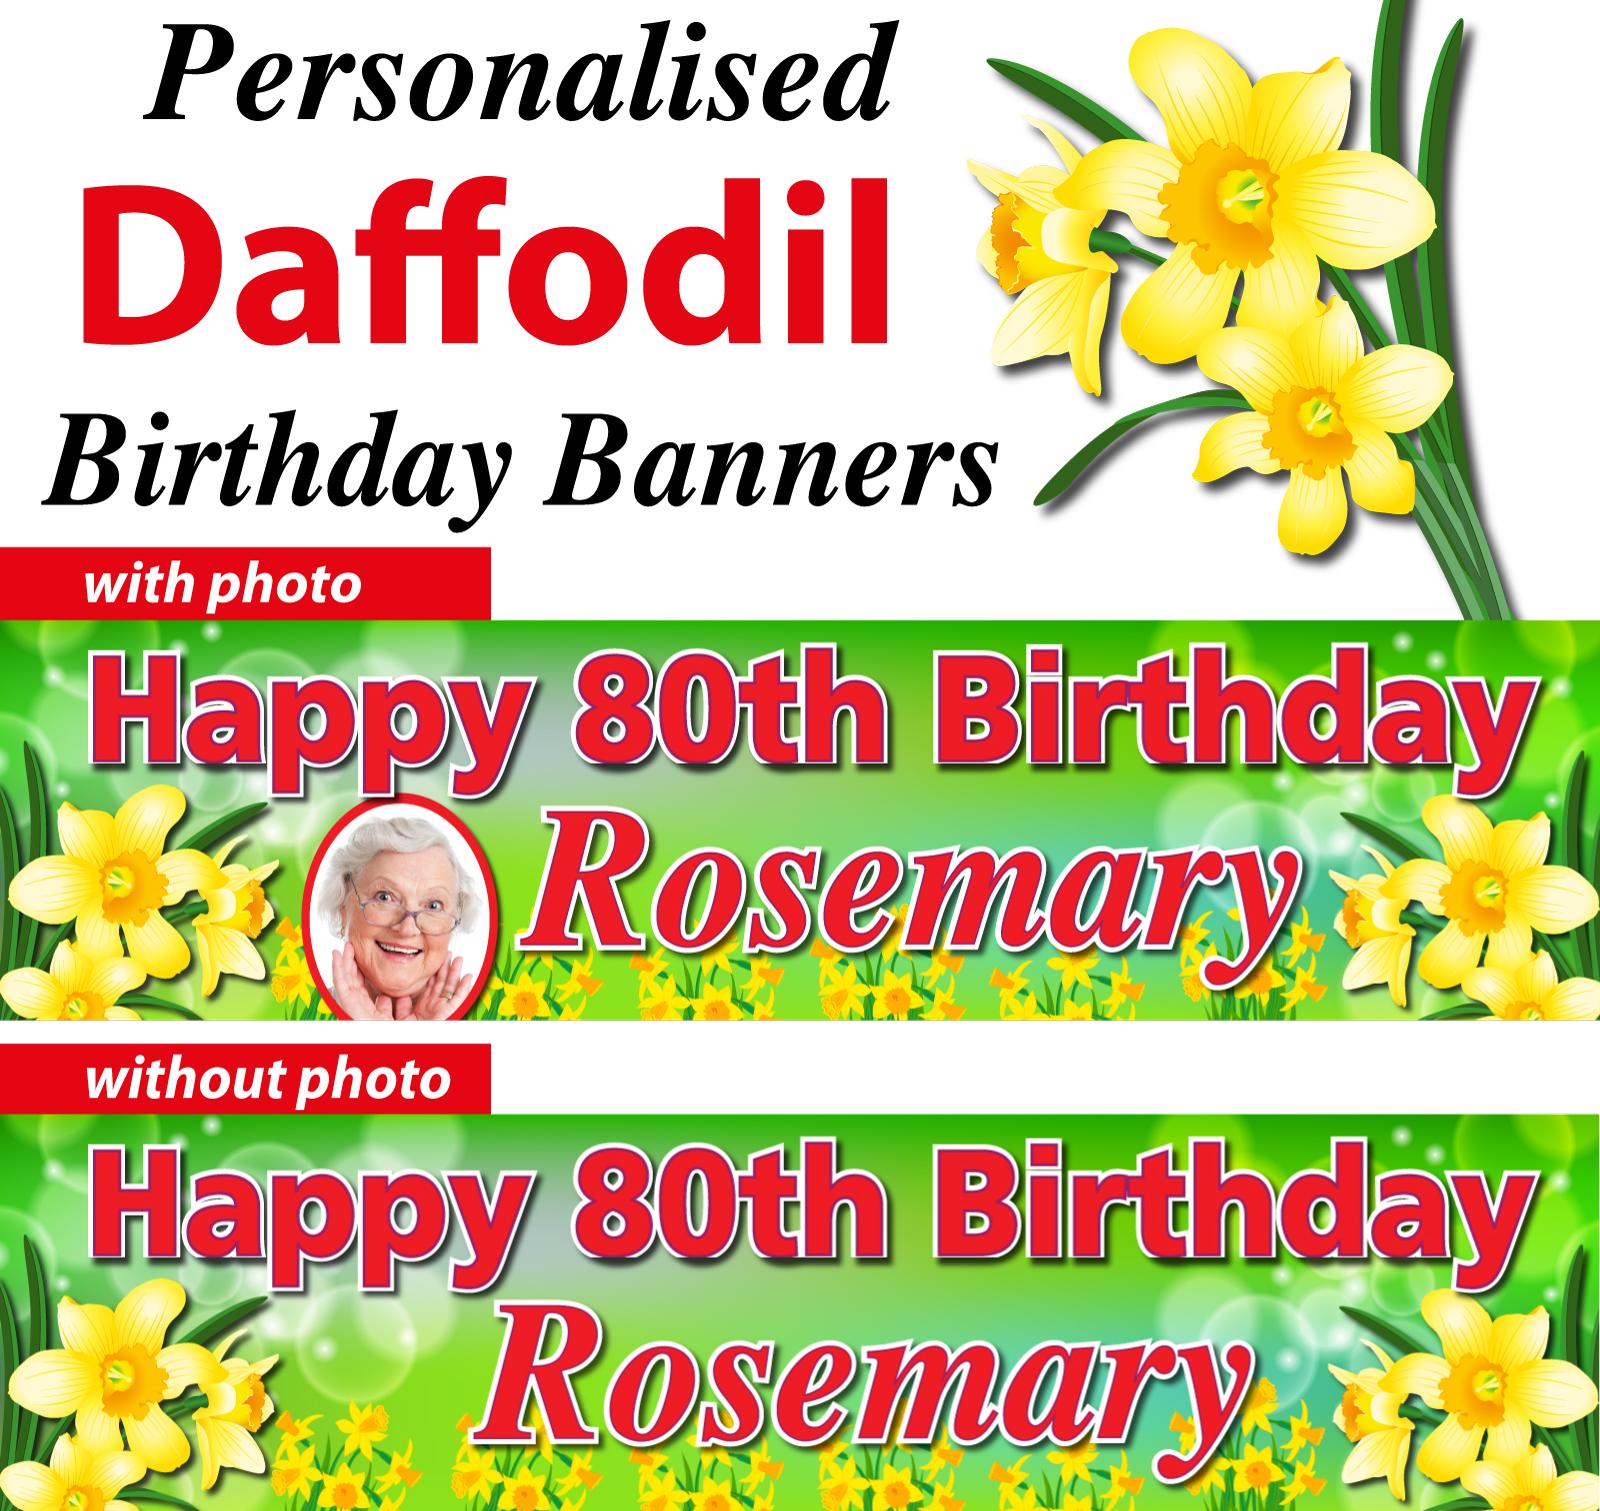 daffodil-birthday-banner-ebay2.jpg